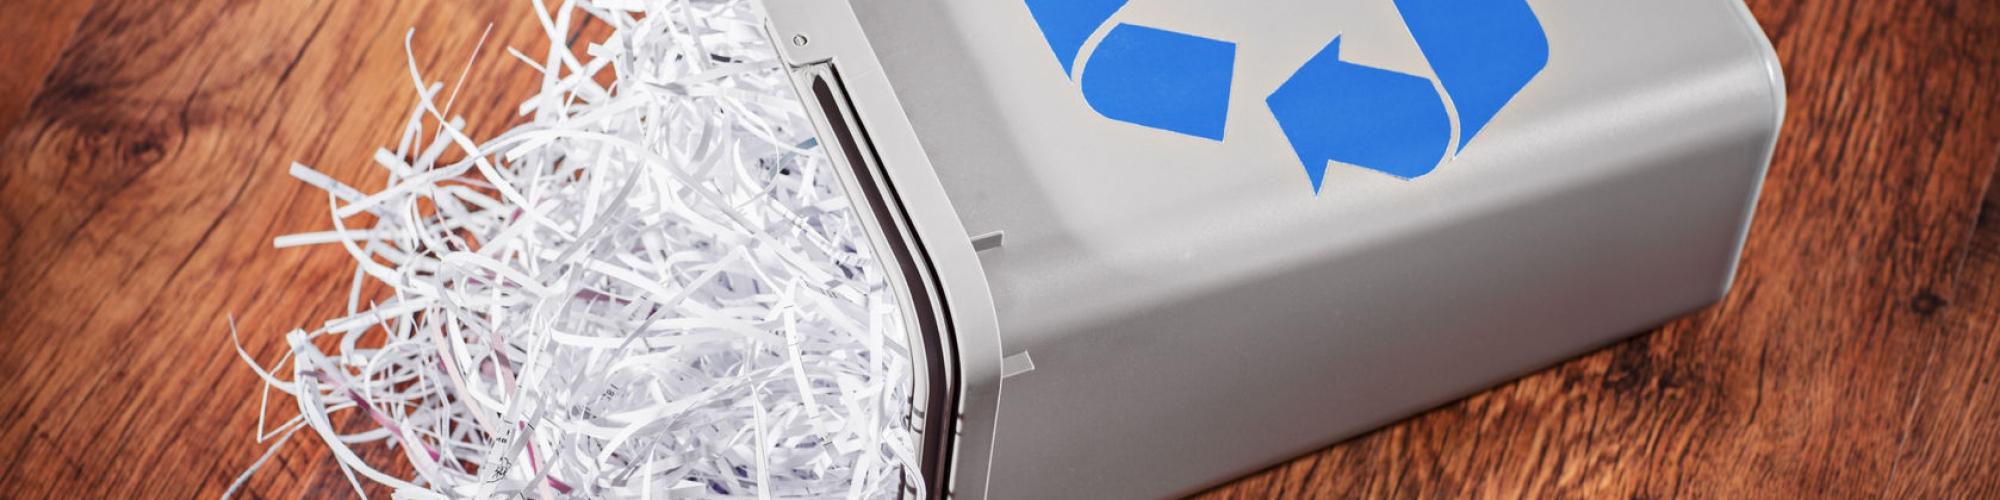 Flipped recycle bin full of shredded paper on a wooden floor